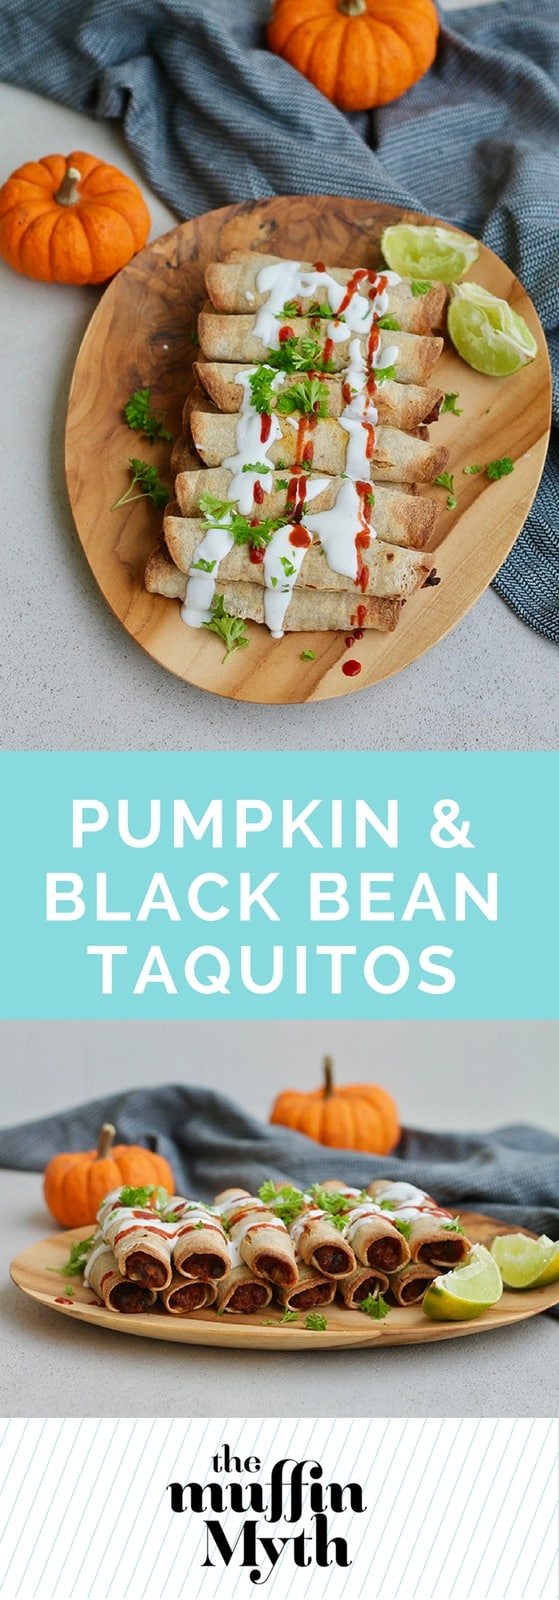 Pumpkin and Black Bean Taquitos // www.heynutritionlady.com #pumpkin #blackbean #vegetarian